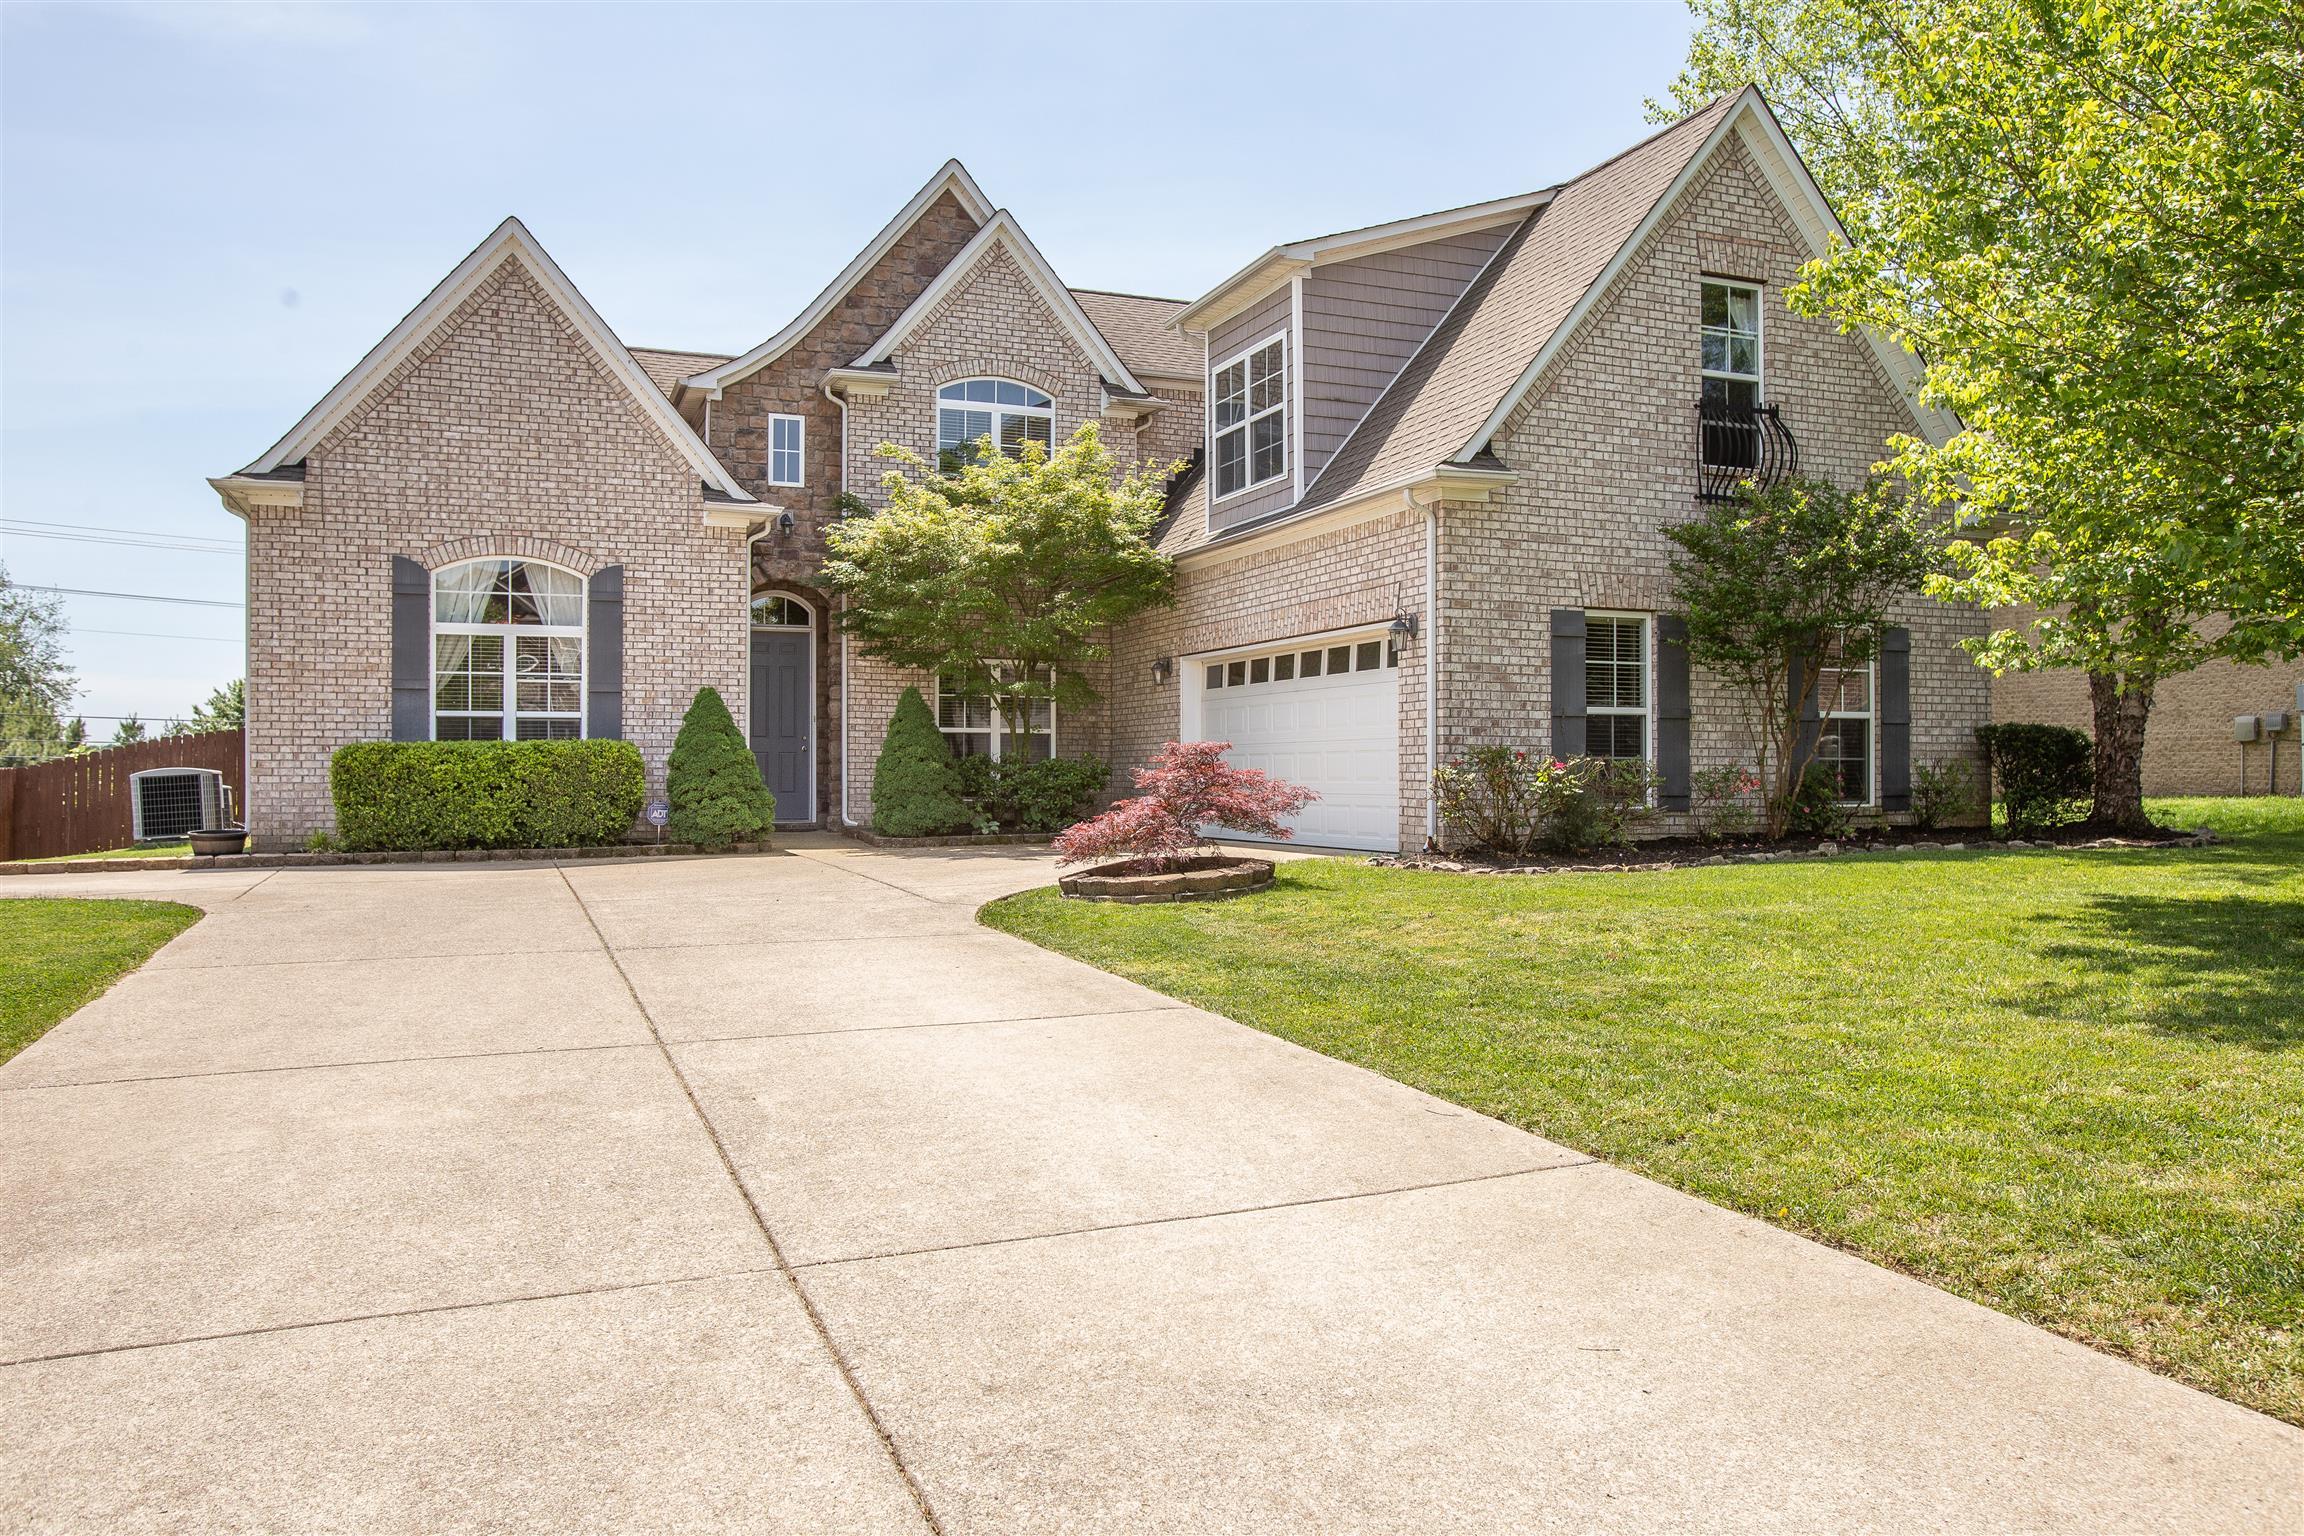 3087 Sakari Circle, Spring Hill, TN 37174 - Spring Hill, TN real estate listing